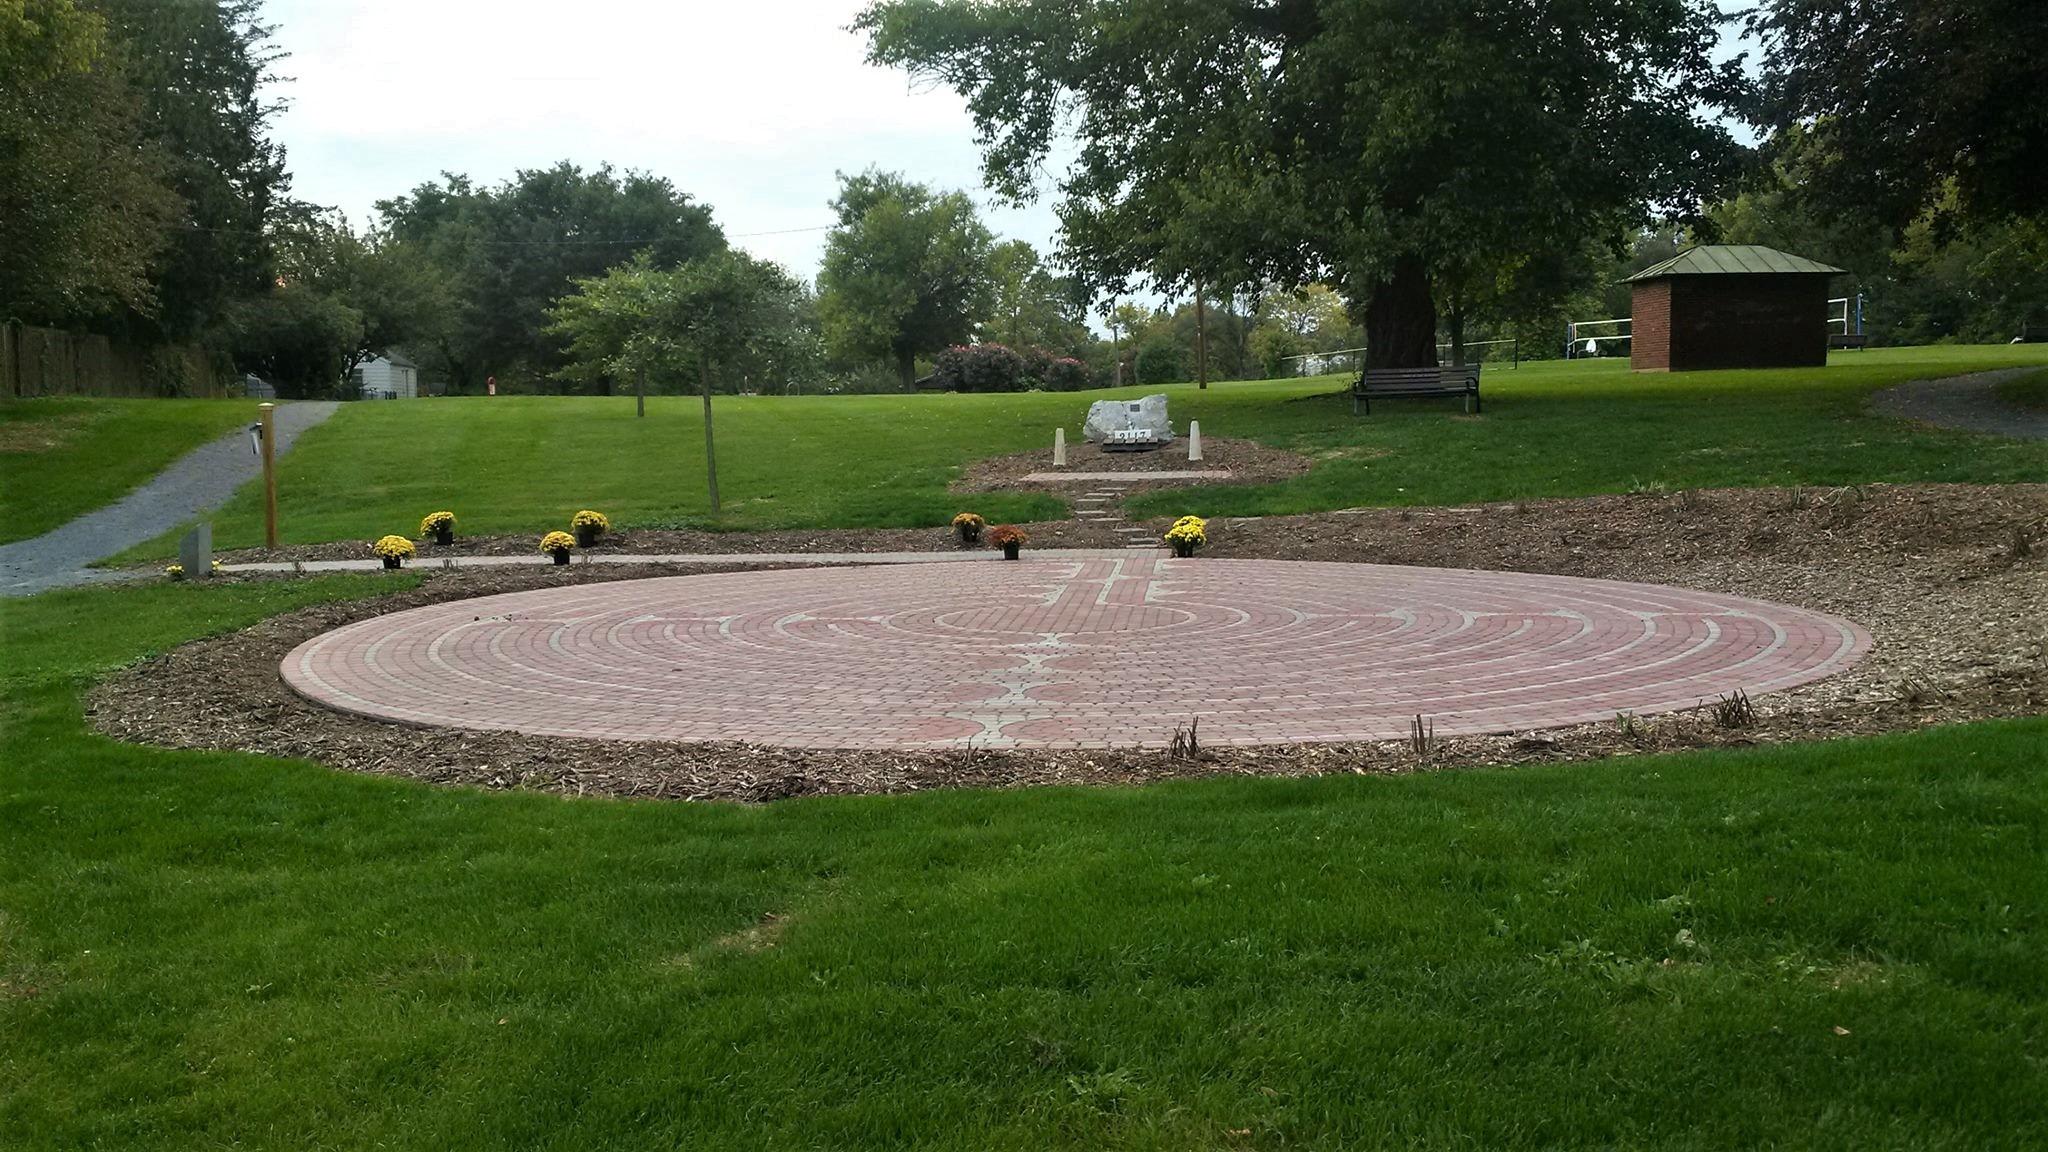 Mindfulness Meditation Pennsylvania Biddle Mission Park Labyrinth